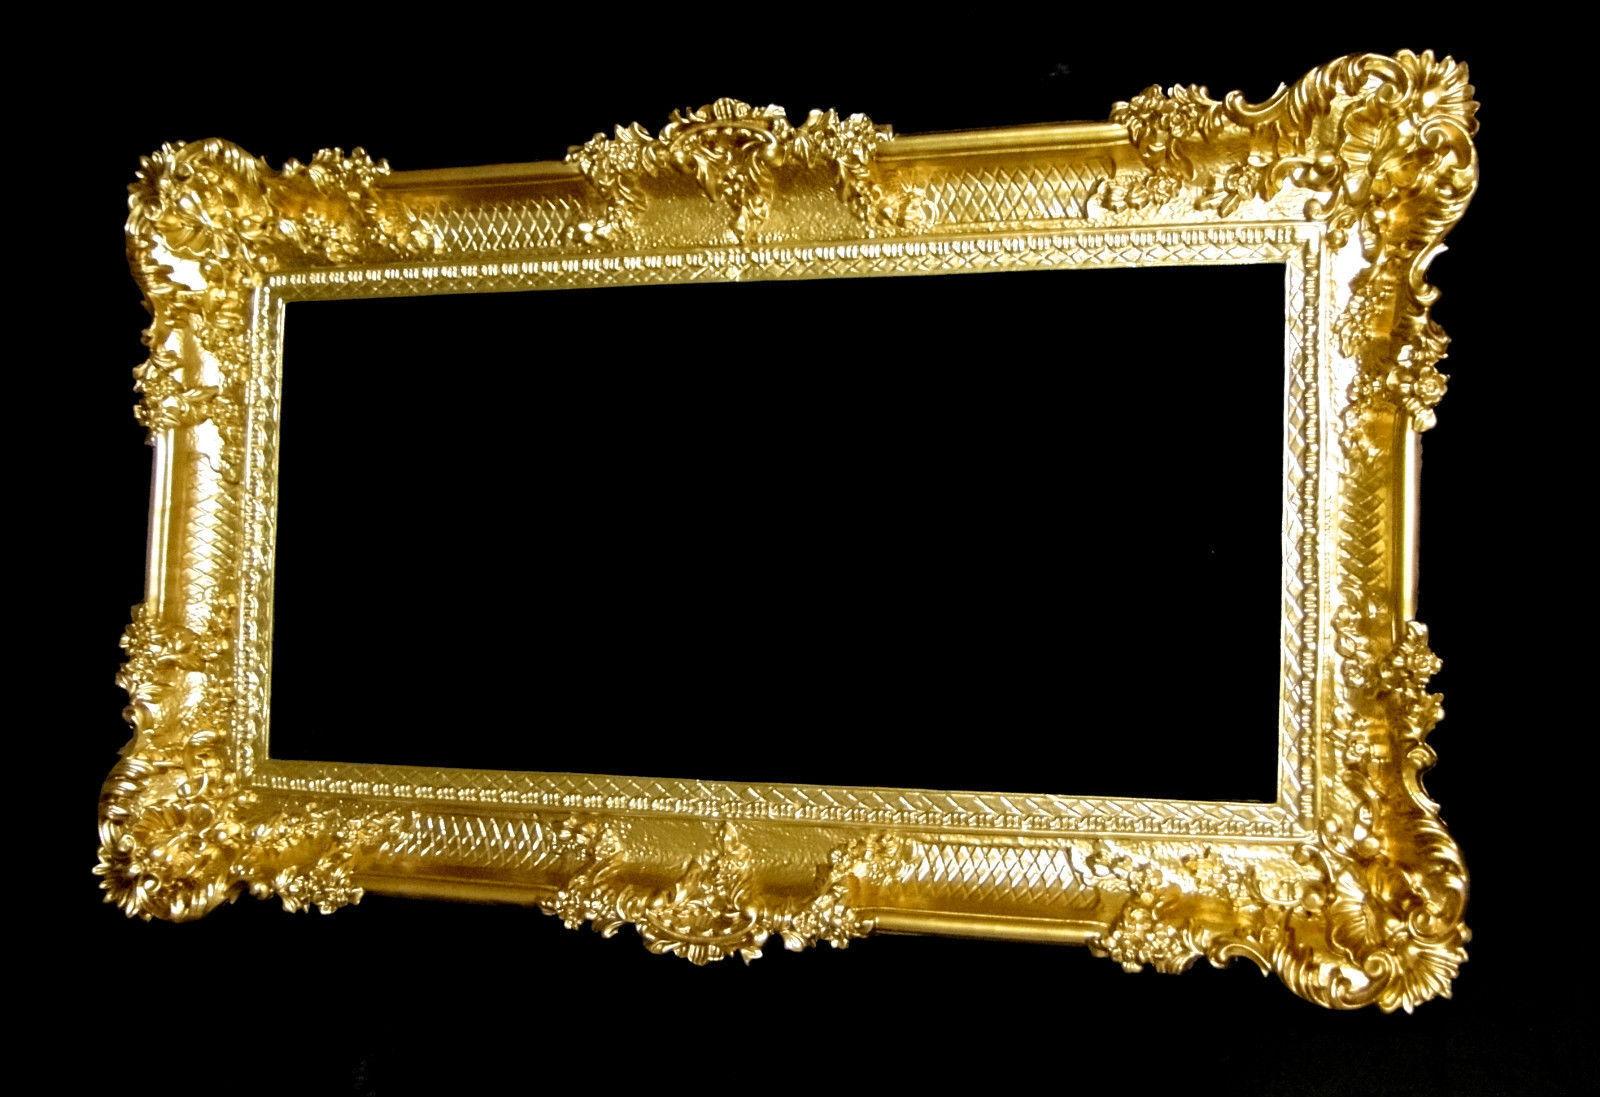 bilderrahmen barock gold günstig kaufen bei Yatego